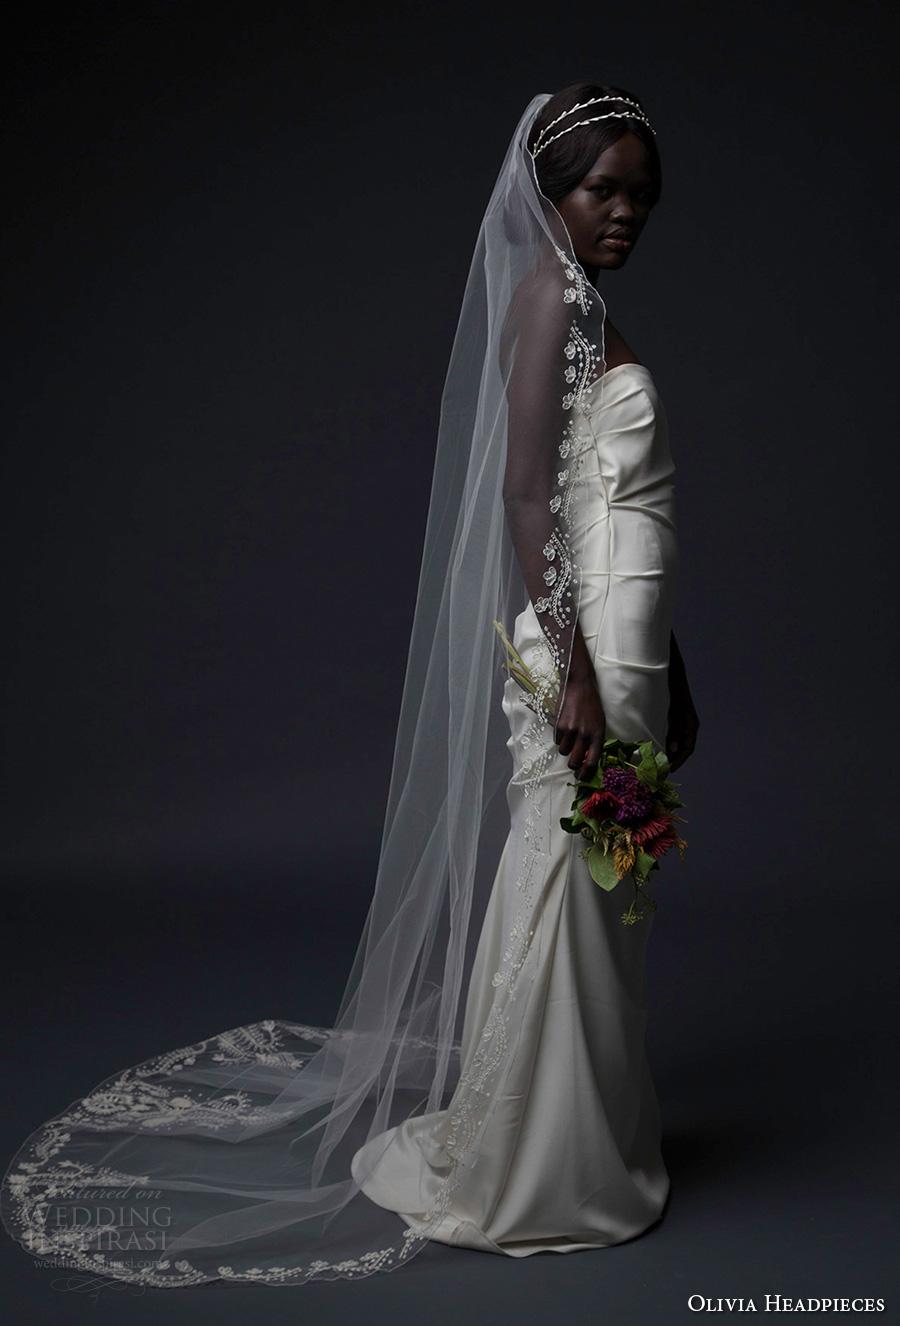 olivia headpieces fall 2016 veils  embroidered hem chapel veil (octavia) mv